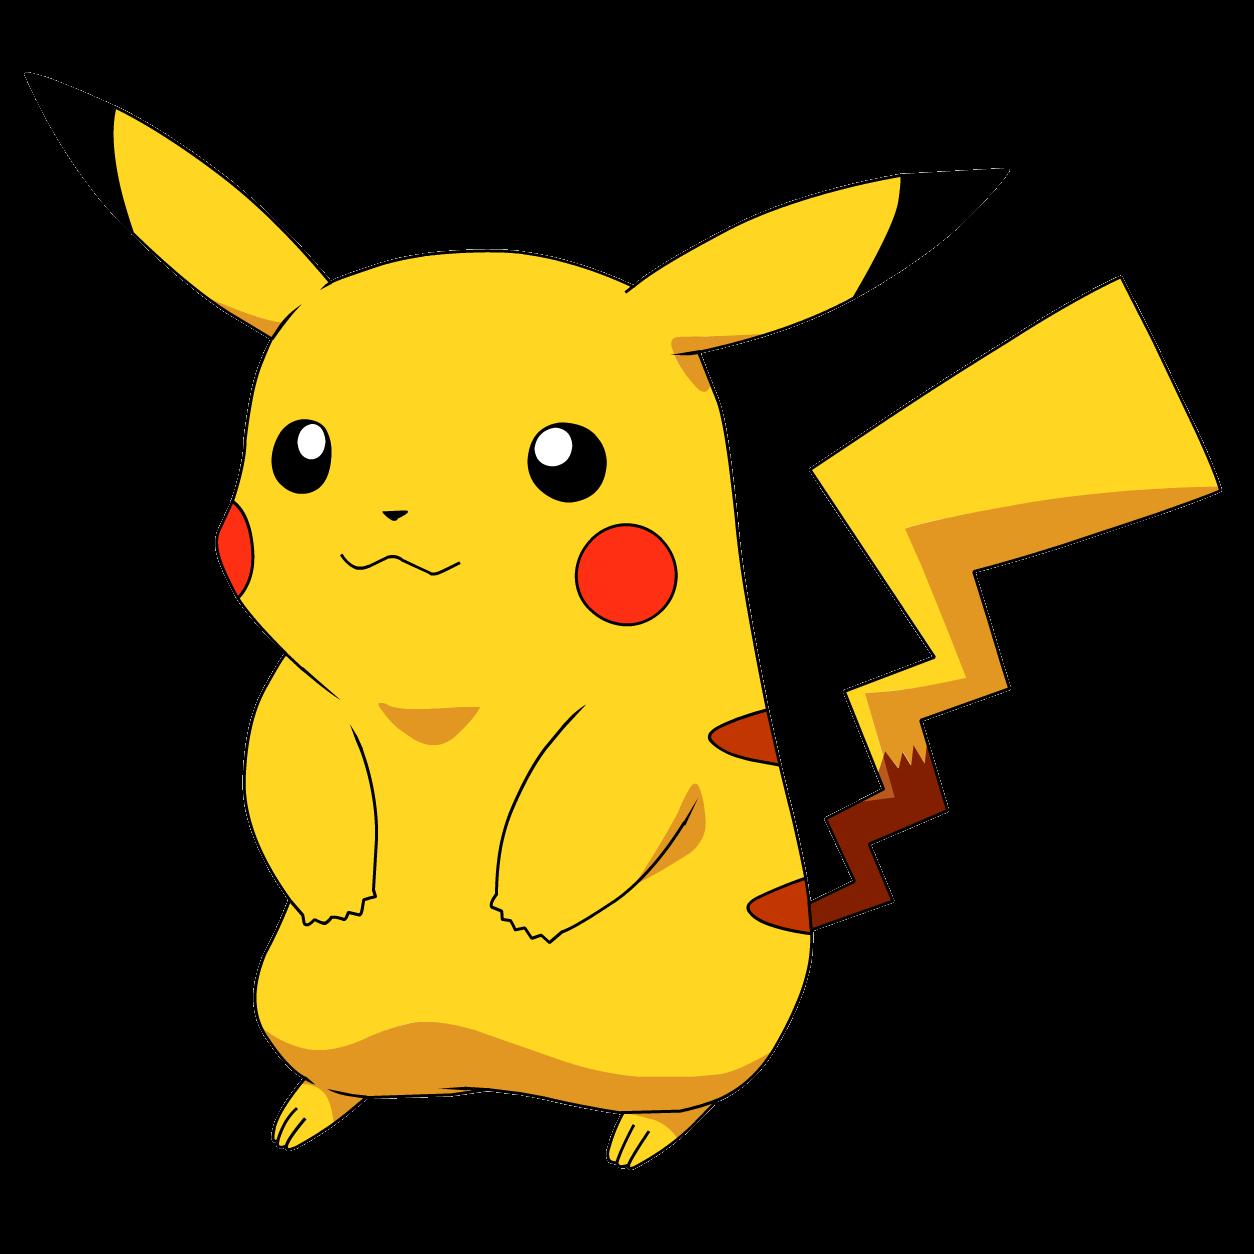 Pikachu clipart transparent FANDOM Wiki Pikachu powered Wikia